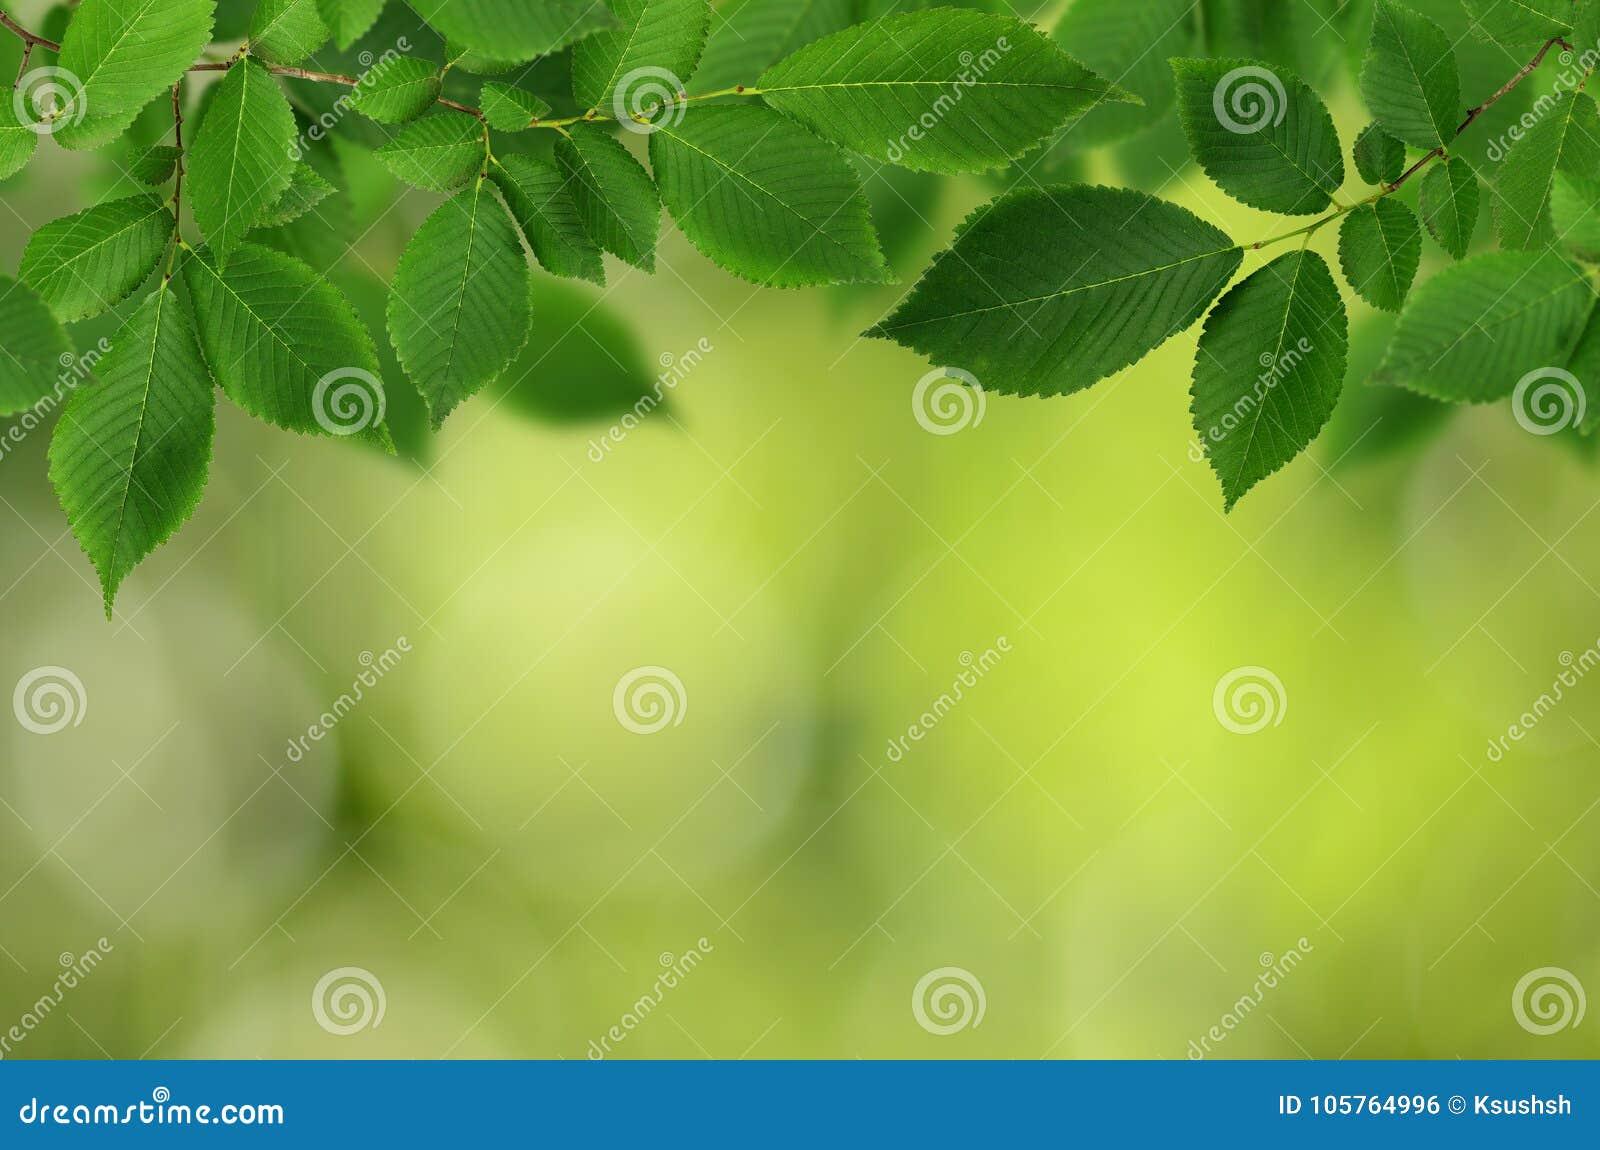 Branch of fresh green elm-tree leaves for background